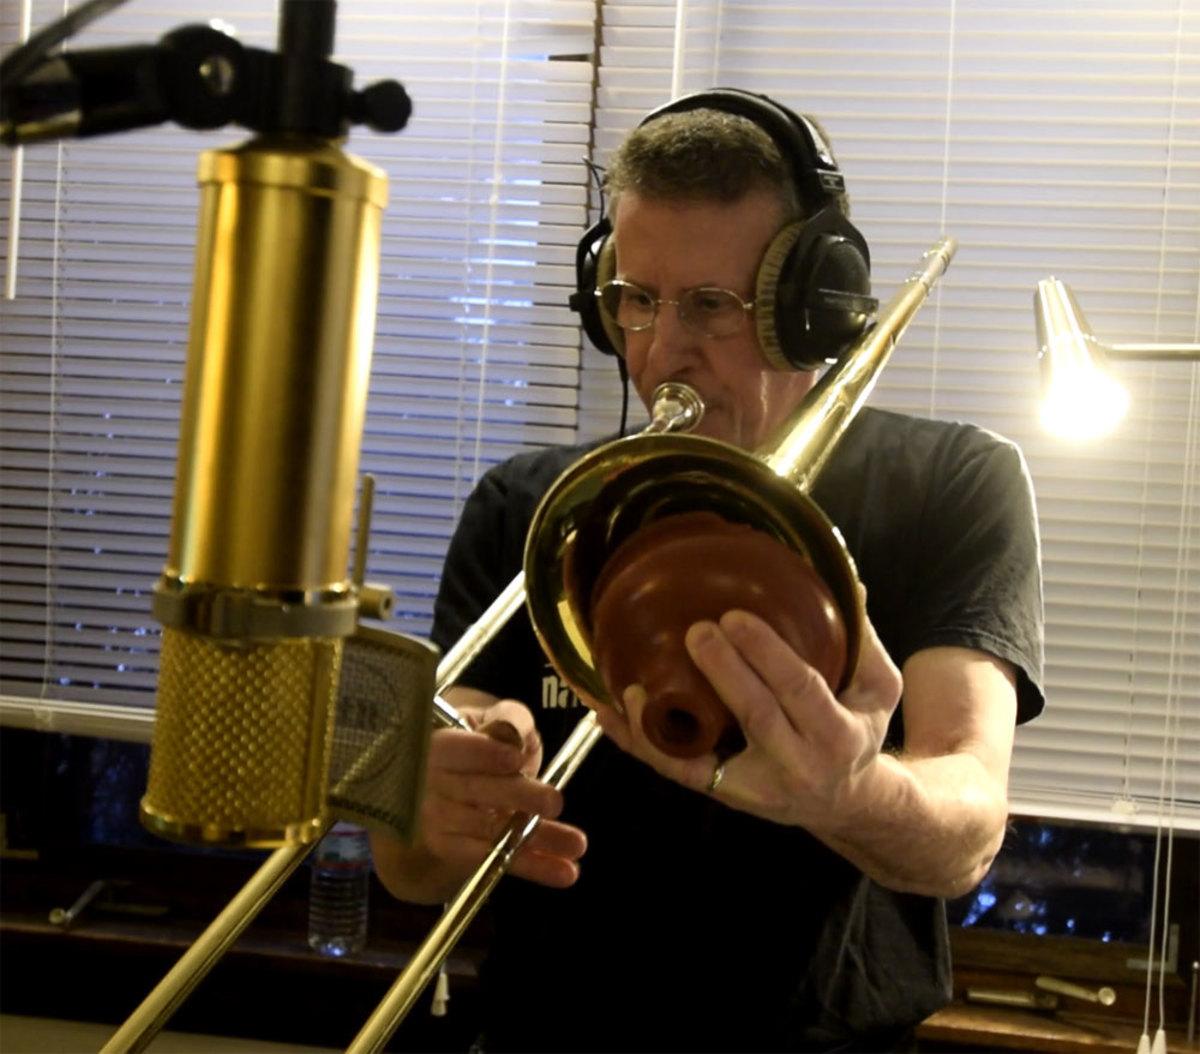 Me in the studio